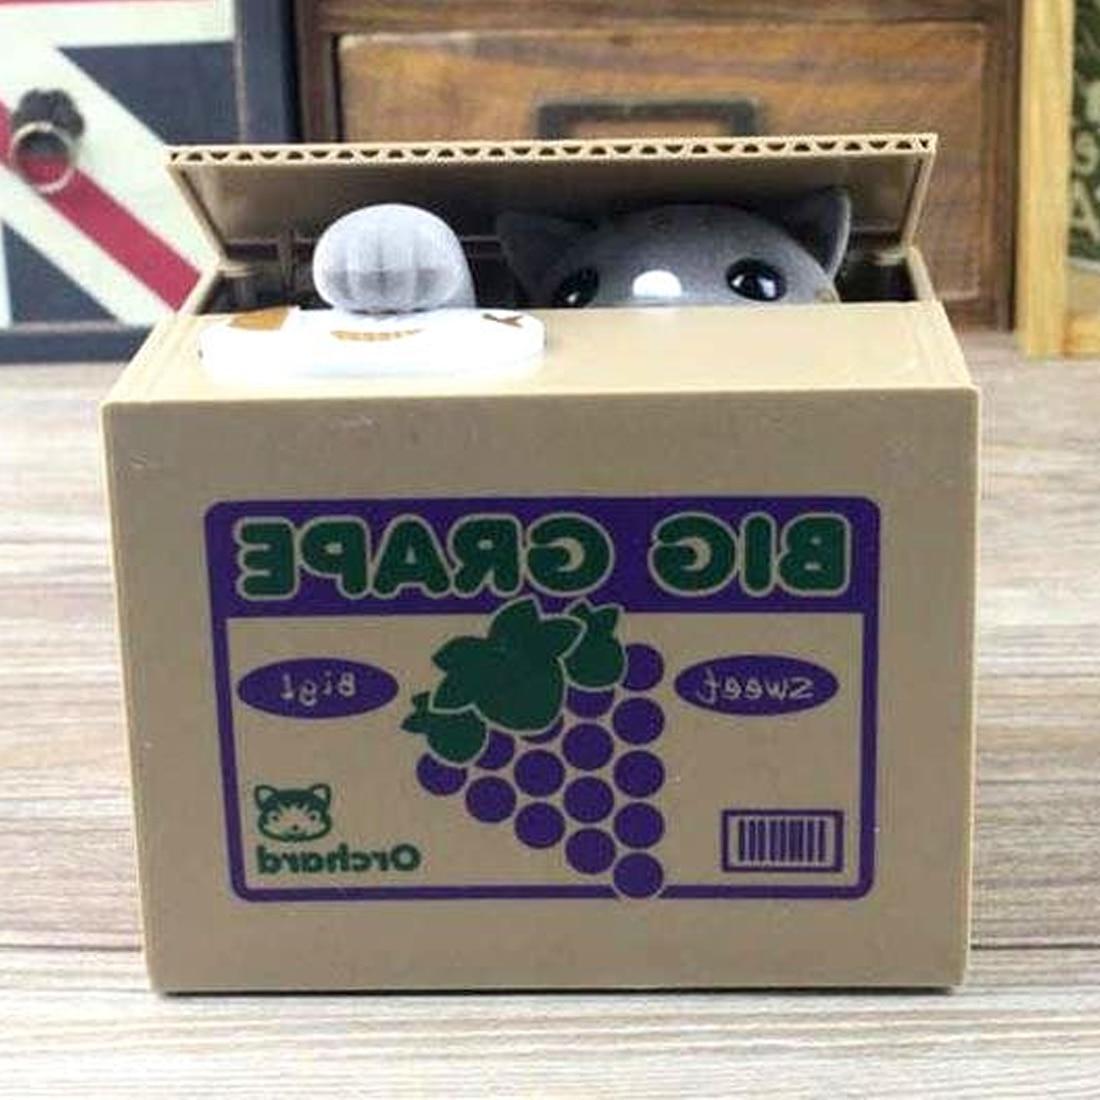 New Super Cute Adorable Cat Stealing Piggy Bank Cat Eat Creative Money Box Safe Box Safes Saving Money Coin Bank Gifts for Kids